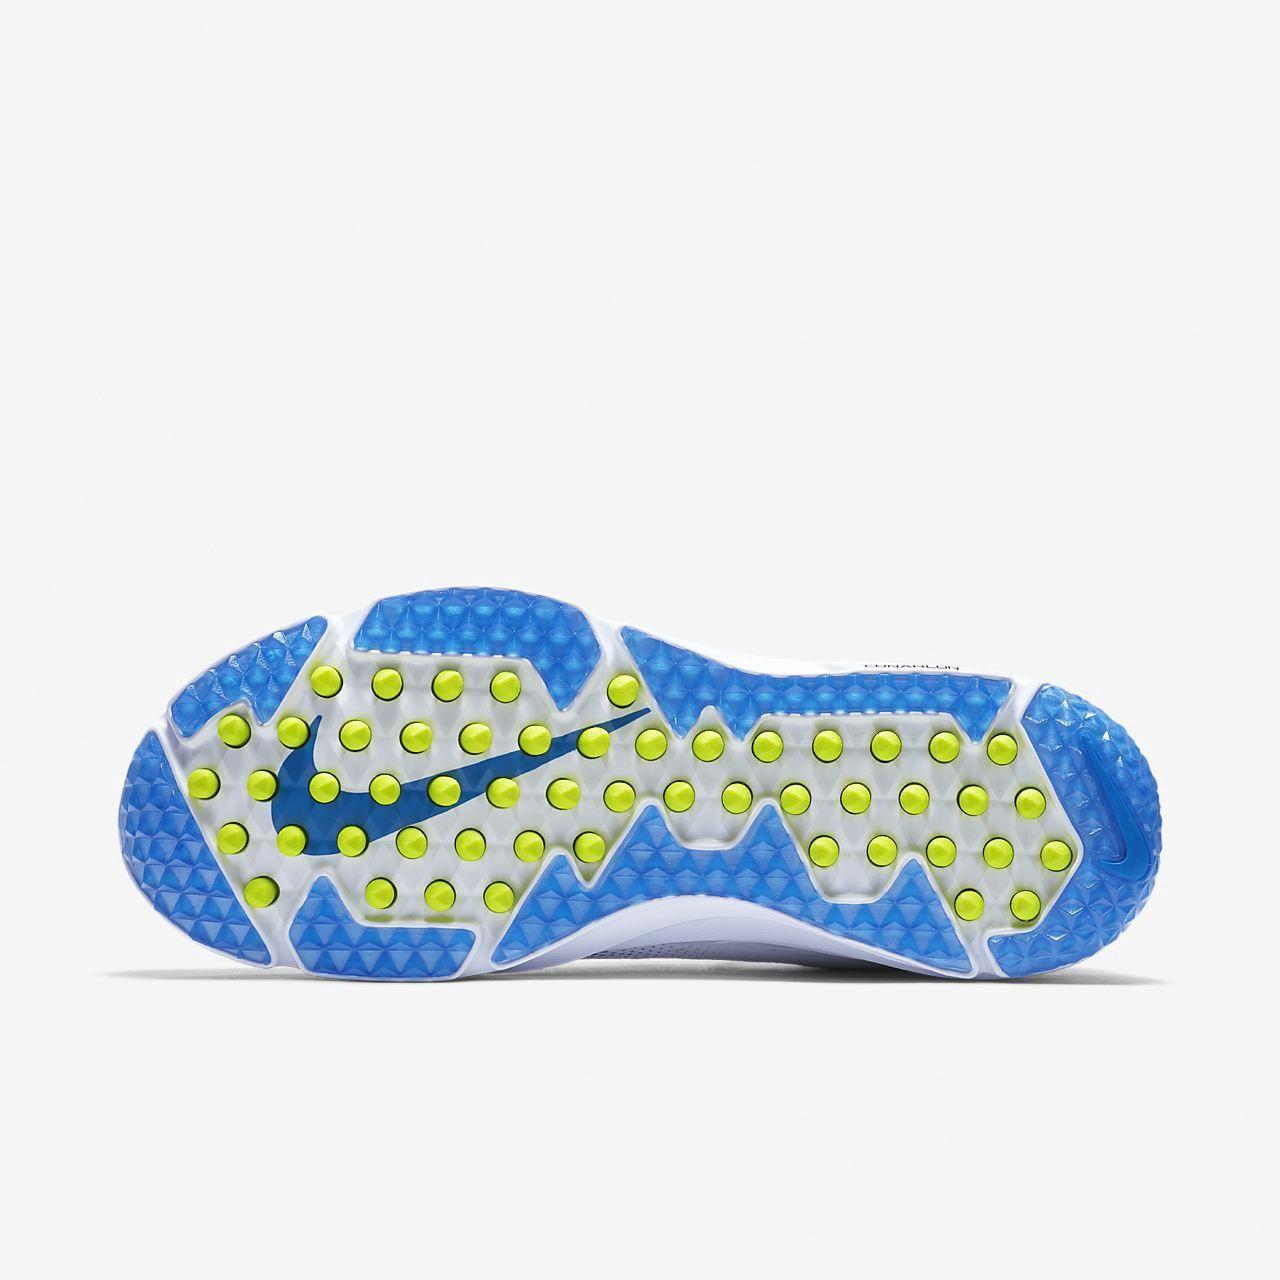 ac320ead7 Nike Vapor Untouchable Speed Turf 2 Men s  football Cleat - 15 ...